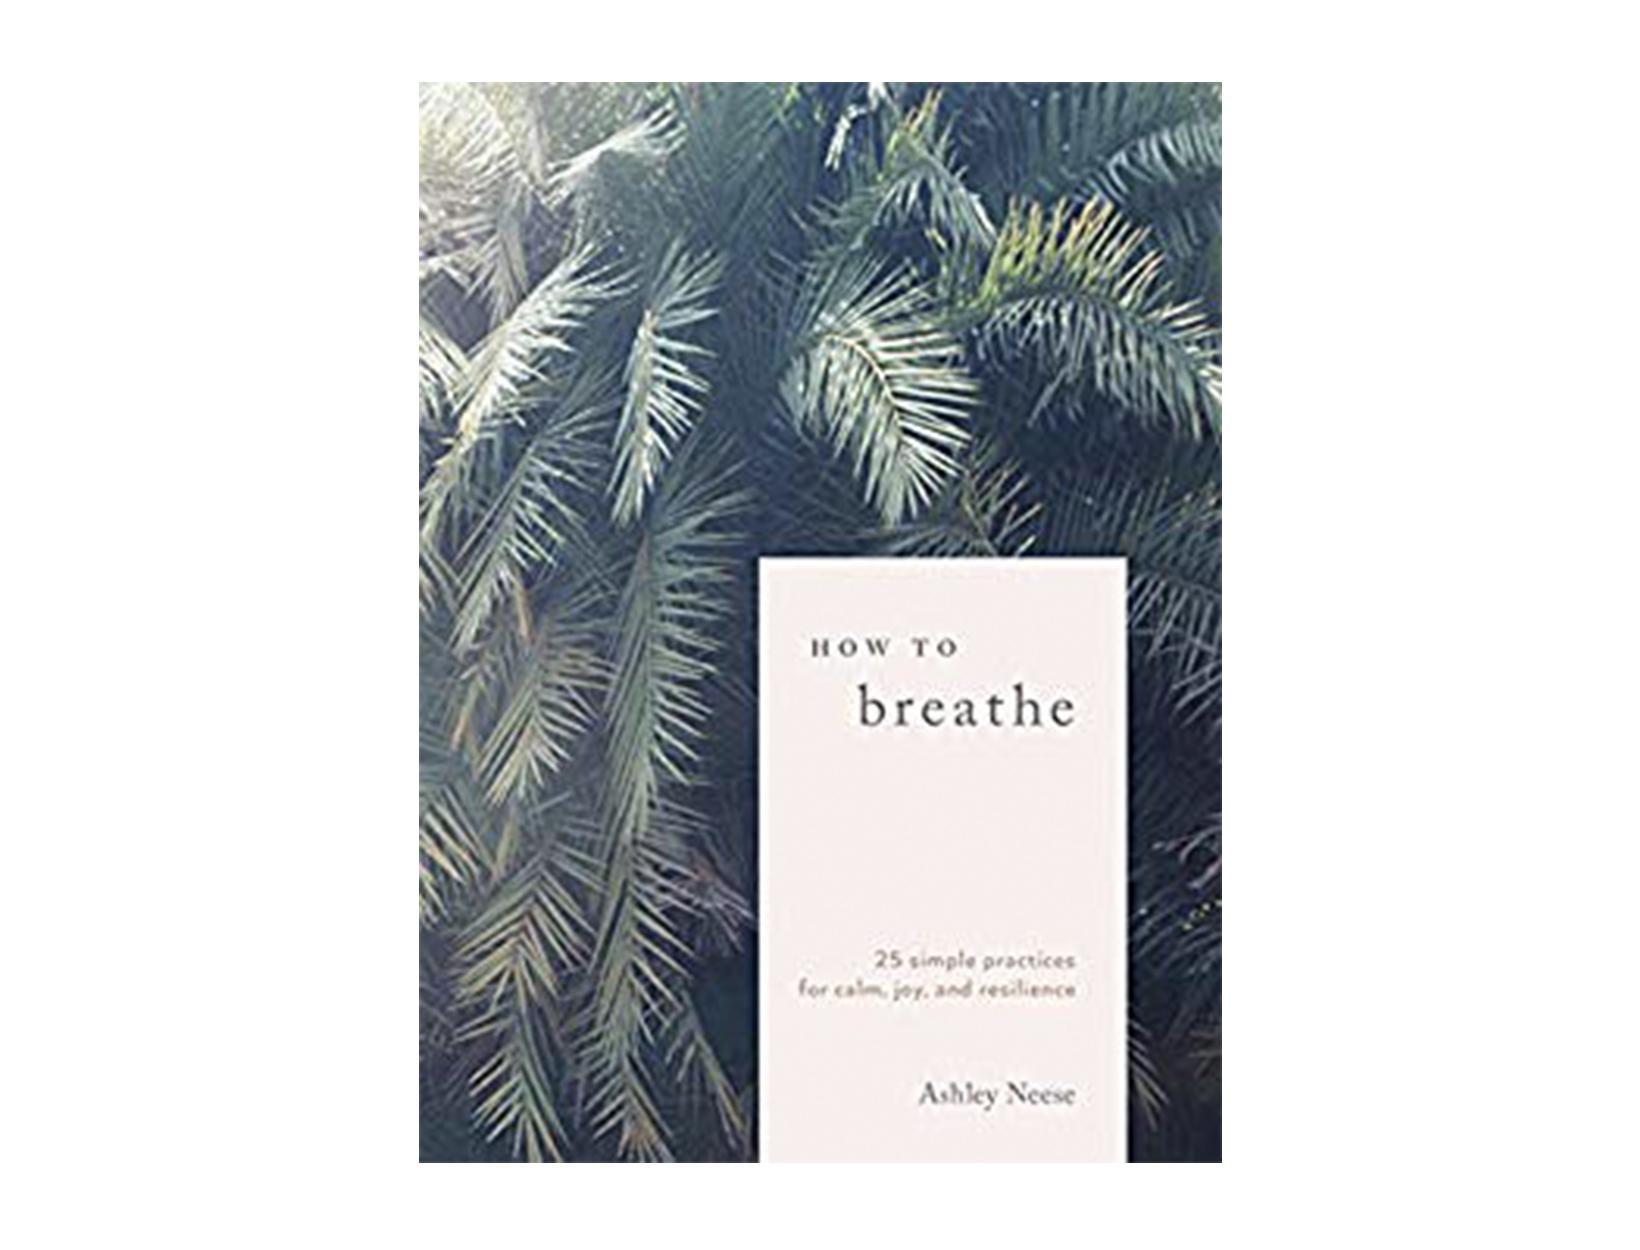 <em>How to Breathe</em> by Ashley Neese